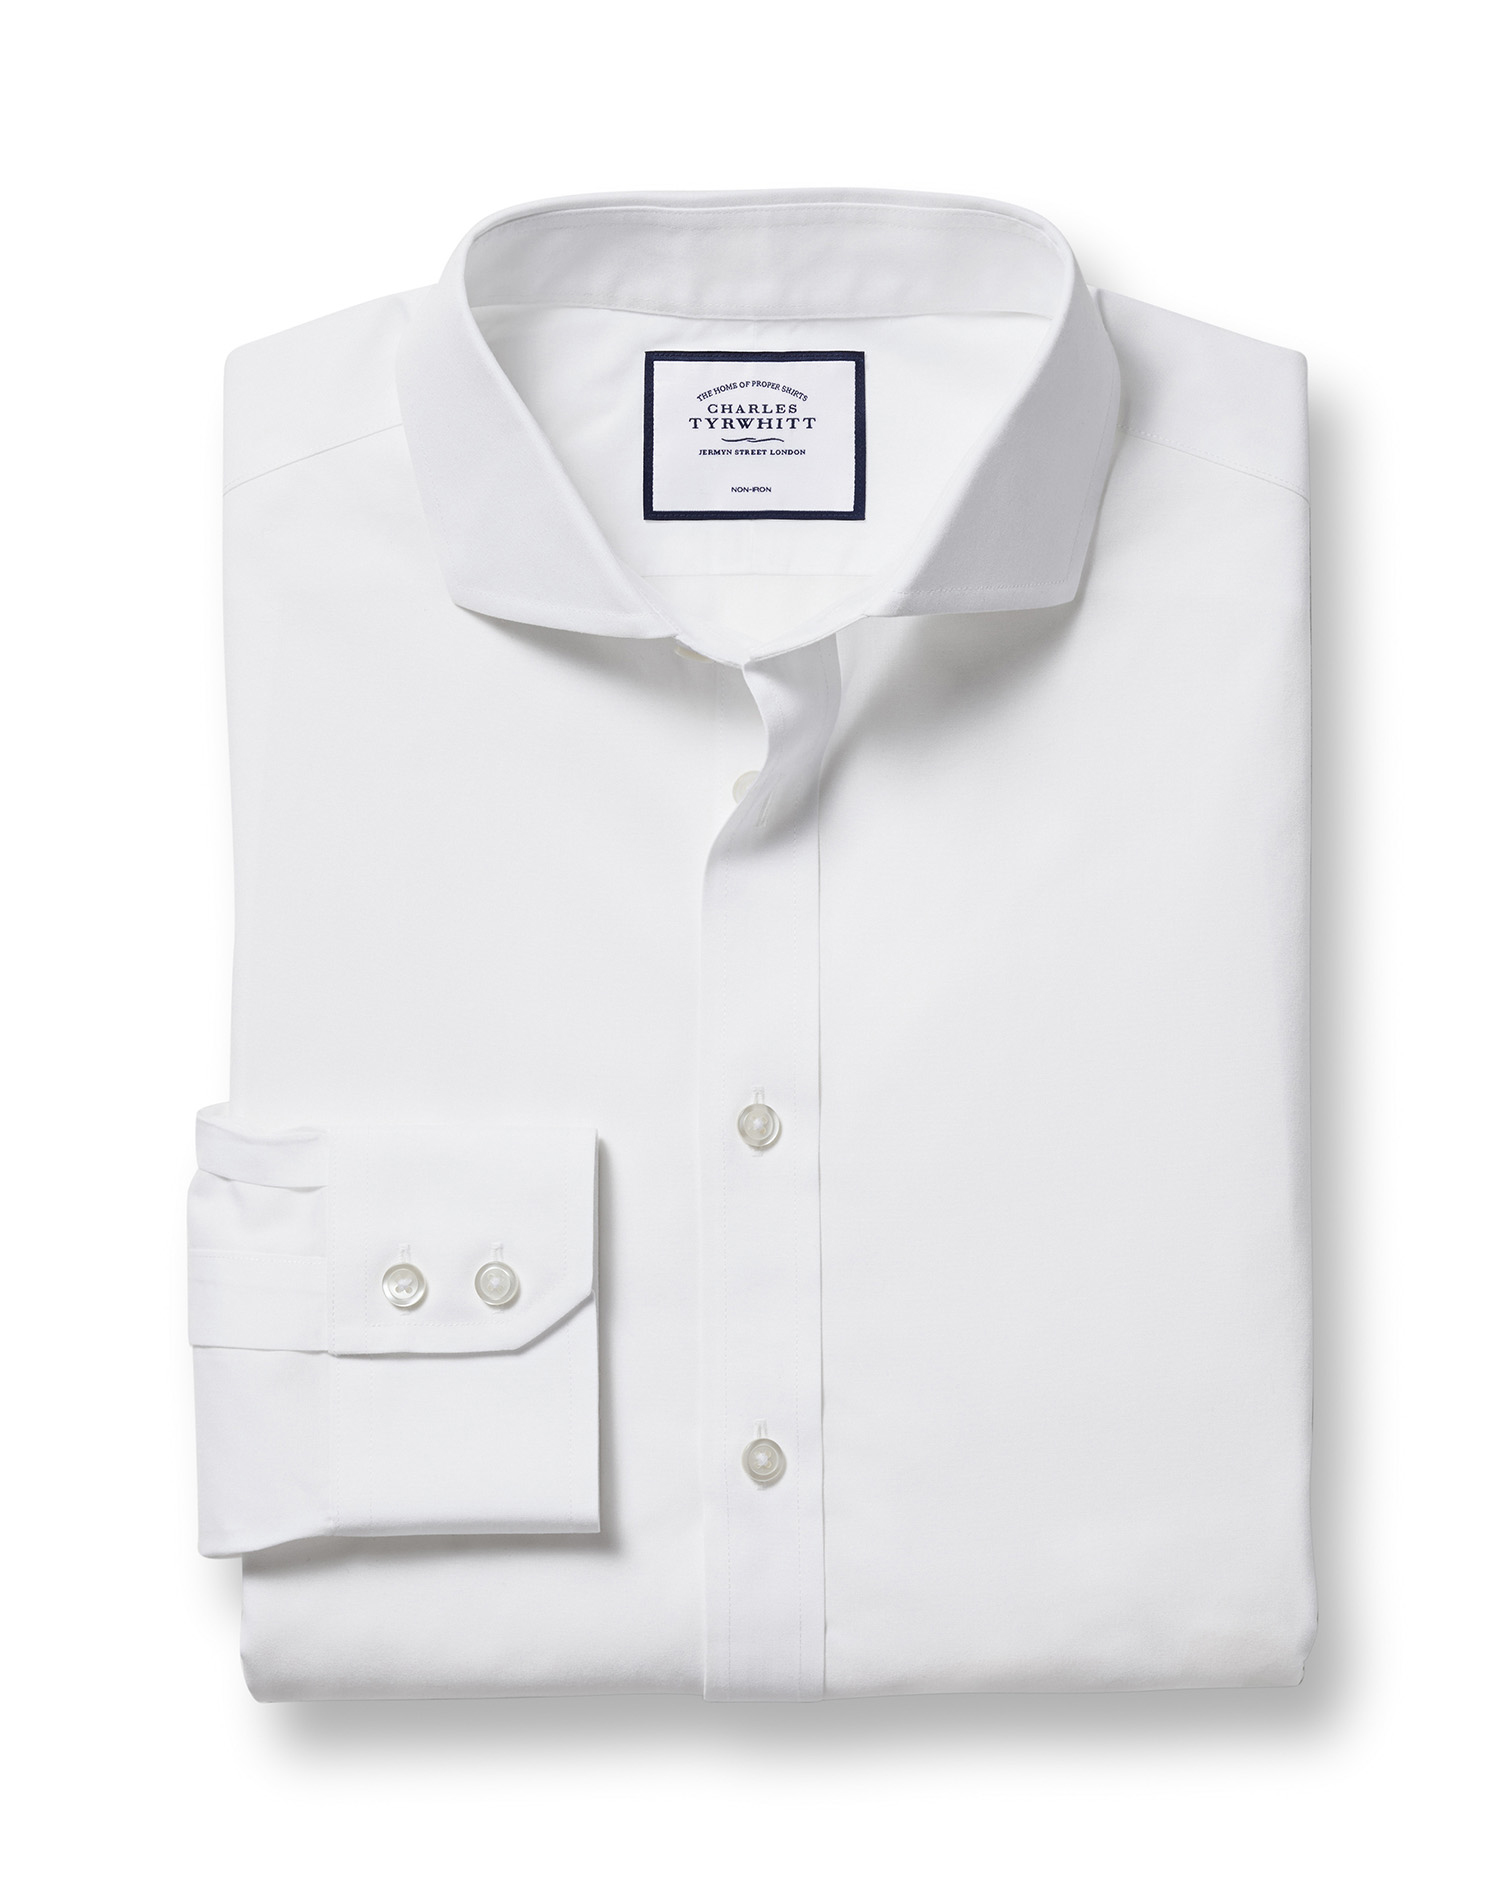 Slim Fit Cutaway Non-Iron Poplin White Cotton Formal Shirt Single Cuff Size 18/37 by Charles Tyrwhit